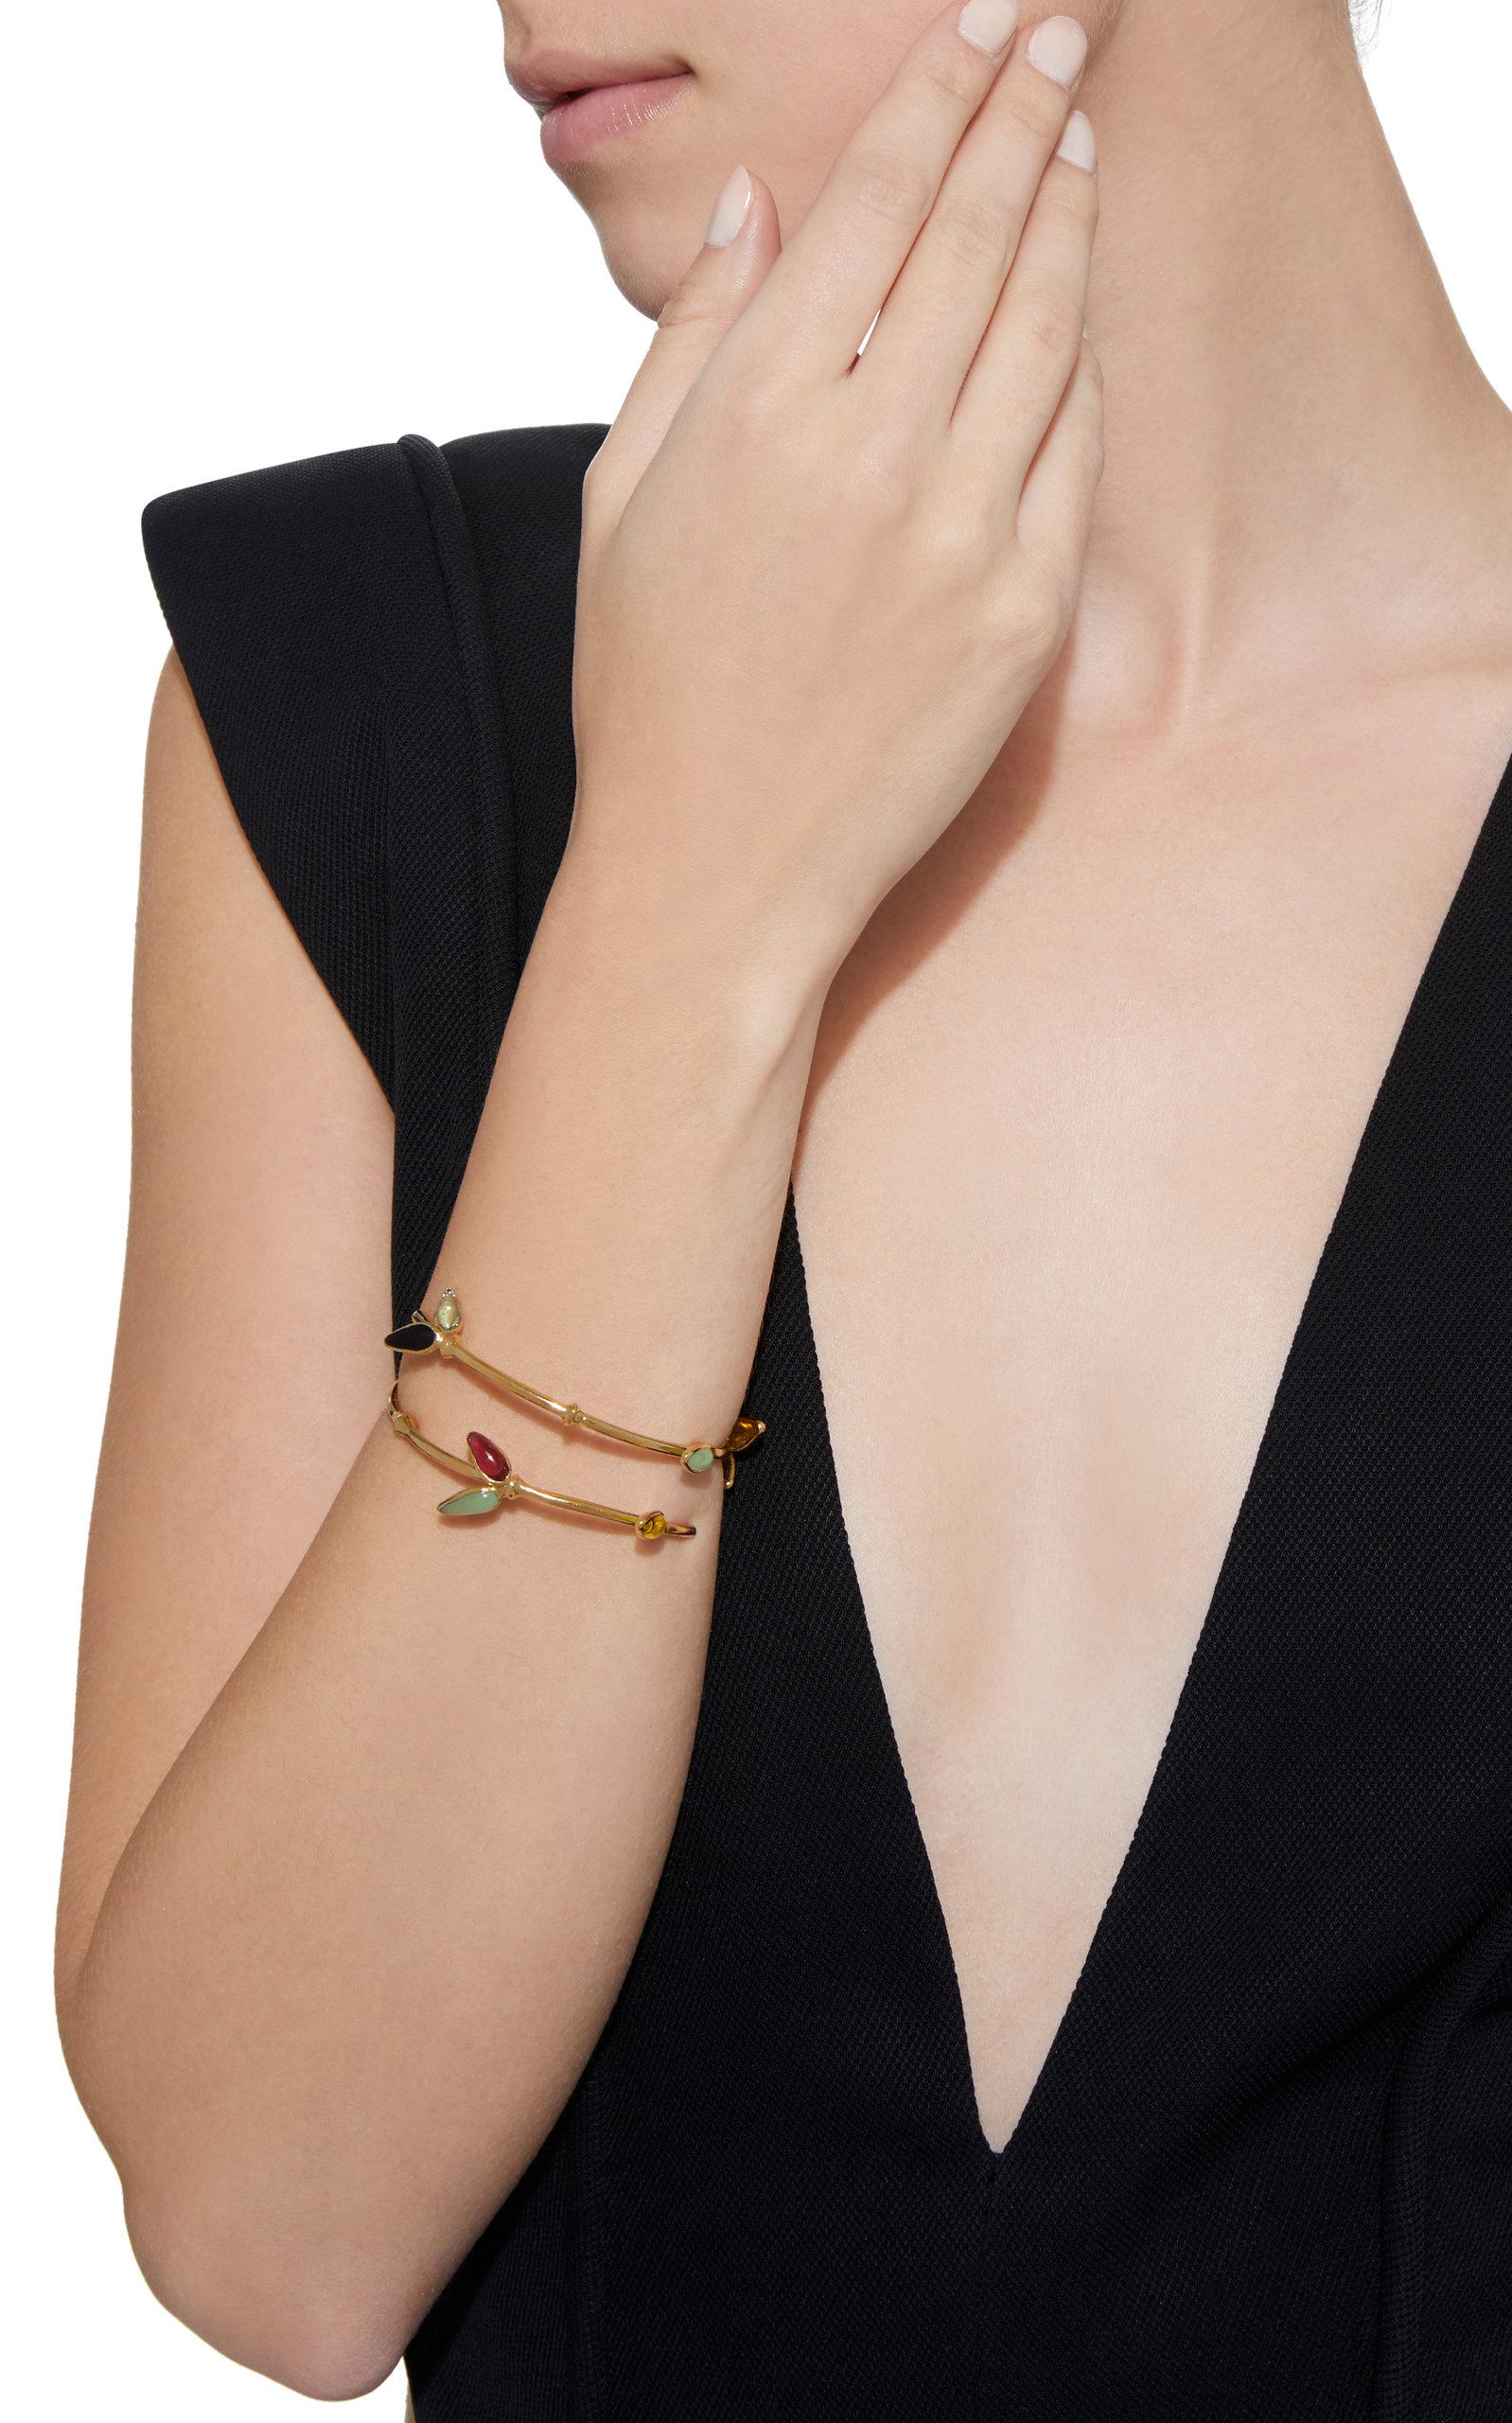 Bamboo Adjustable 24K Gold-Plated Brass and Poured Glass Bangle Bracelet Gripoix kgFRJ